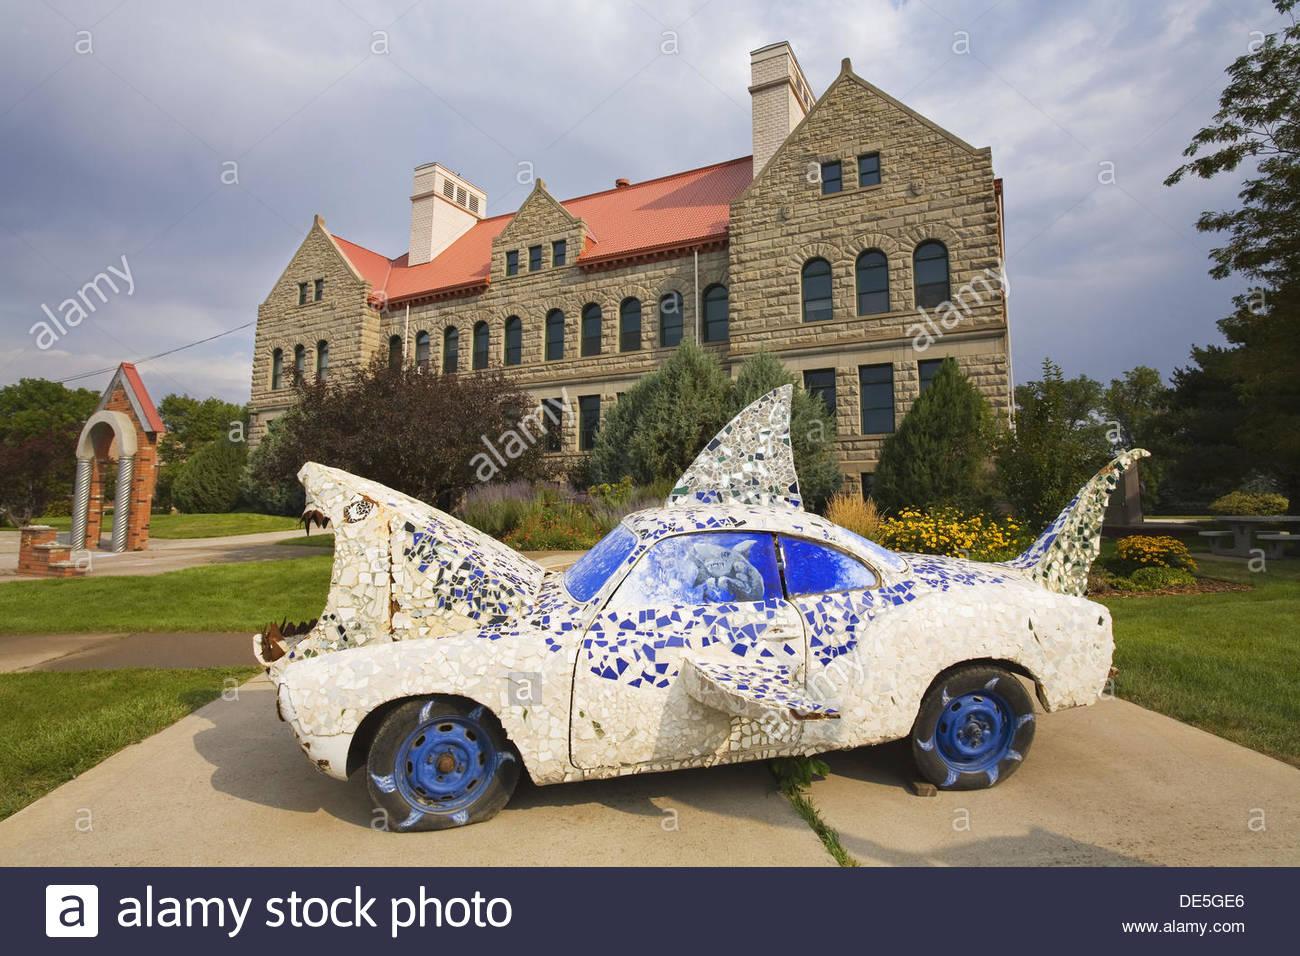 Great White Shark By High School Kids Museum Of Art